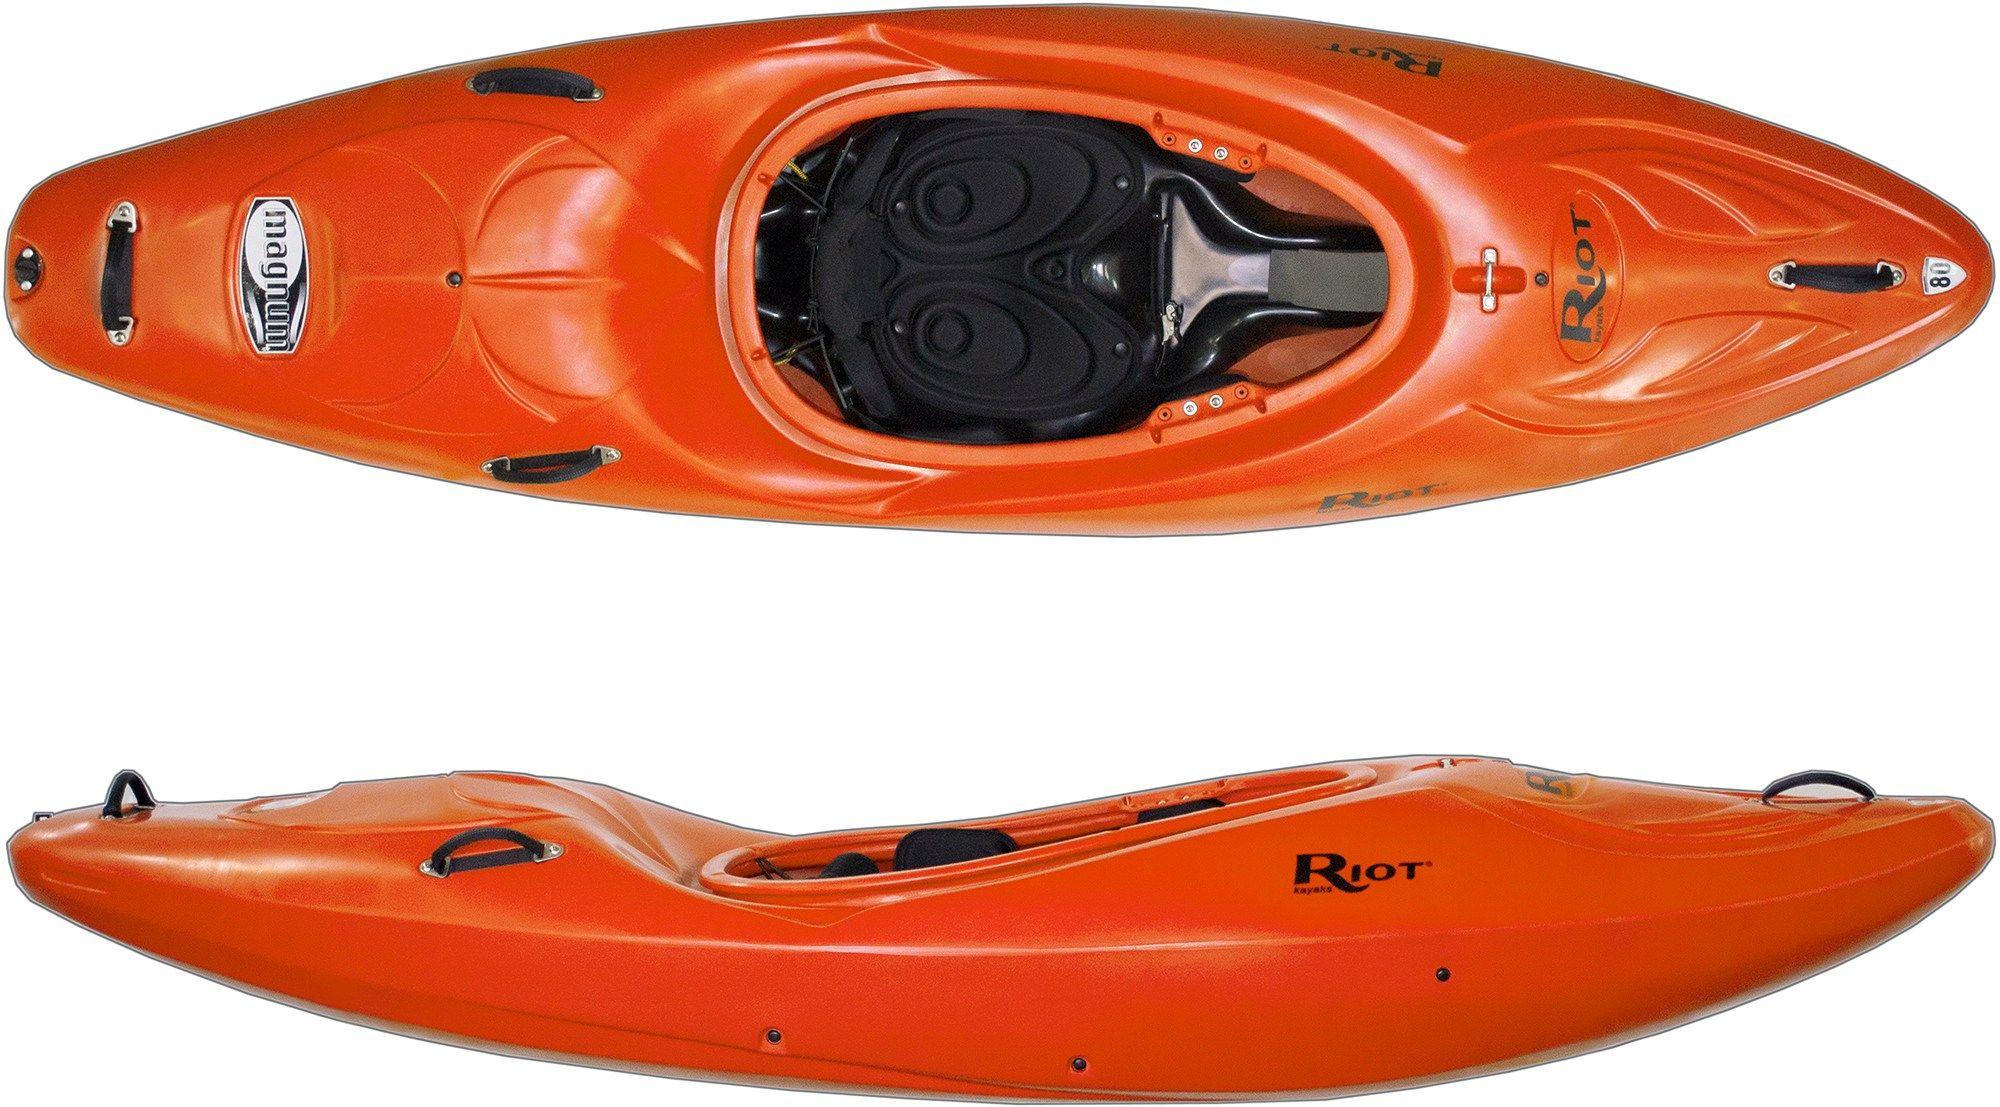 Riot Whitewater Kayak Review